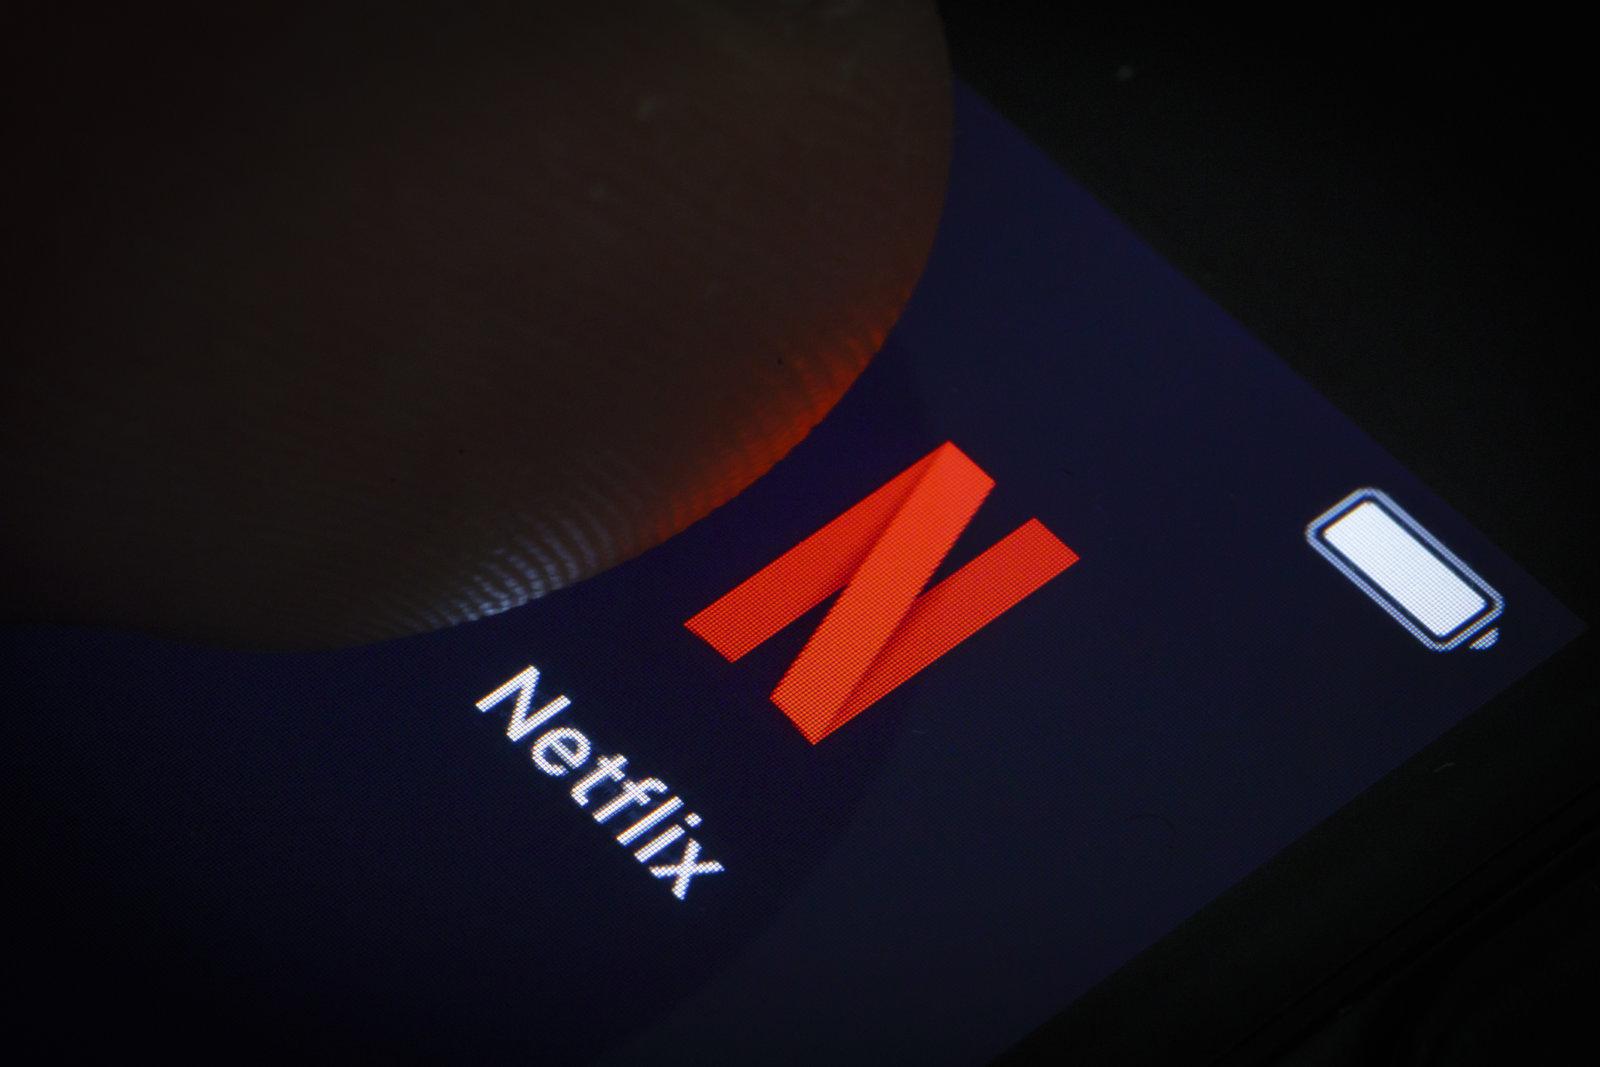 Method | Netflix Via Paypal Working perfect - Cracking Gate